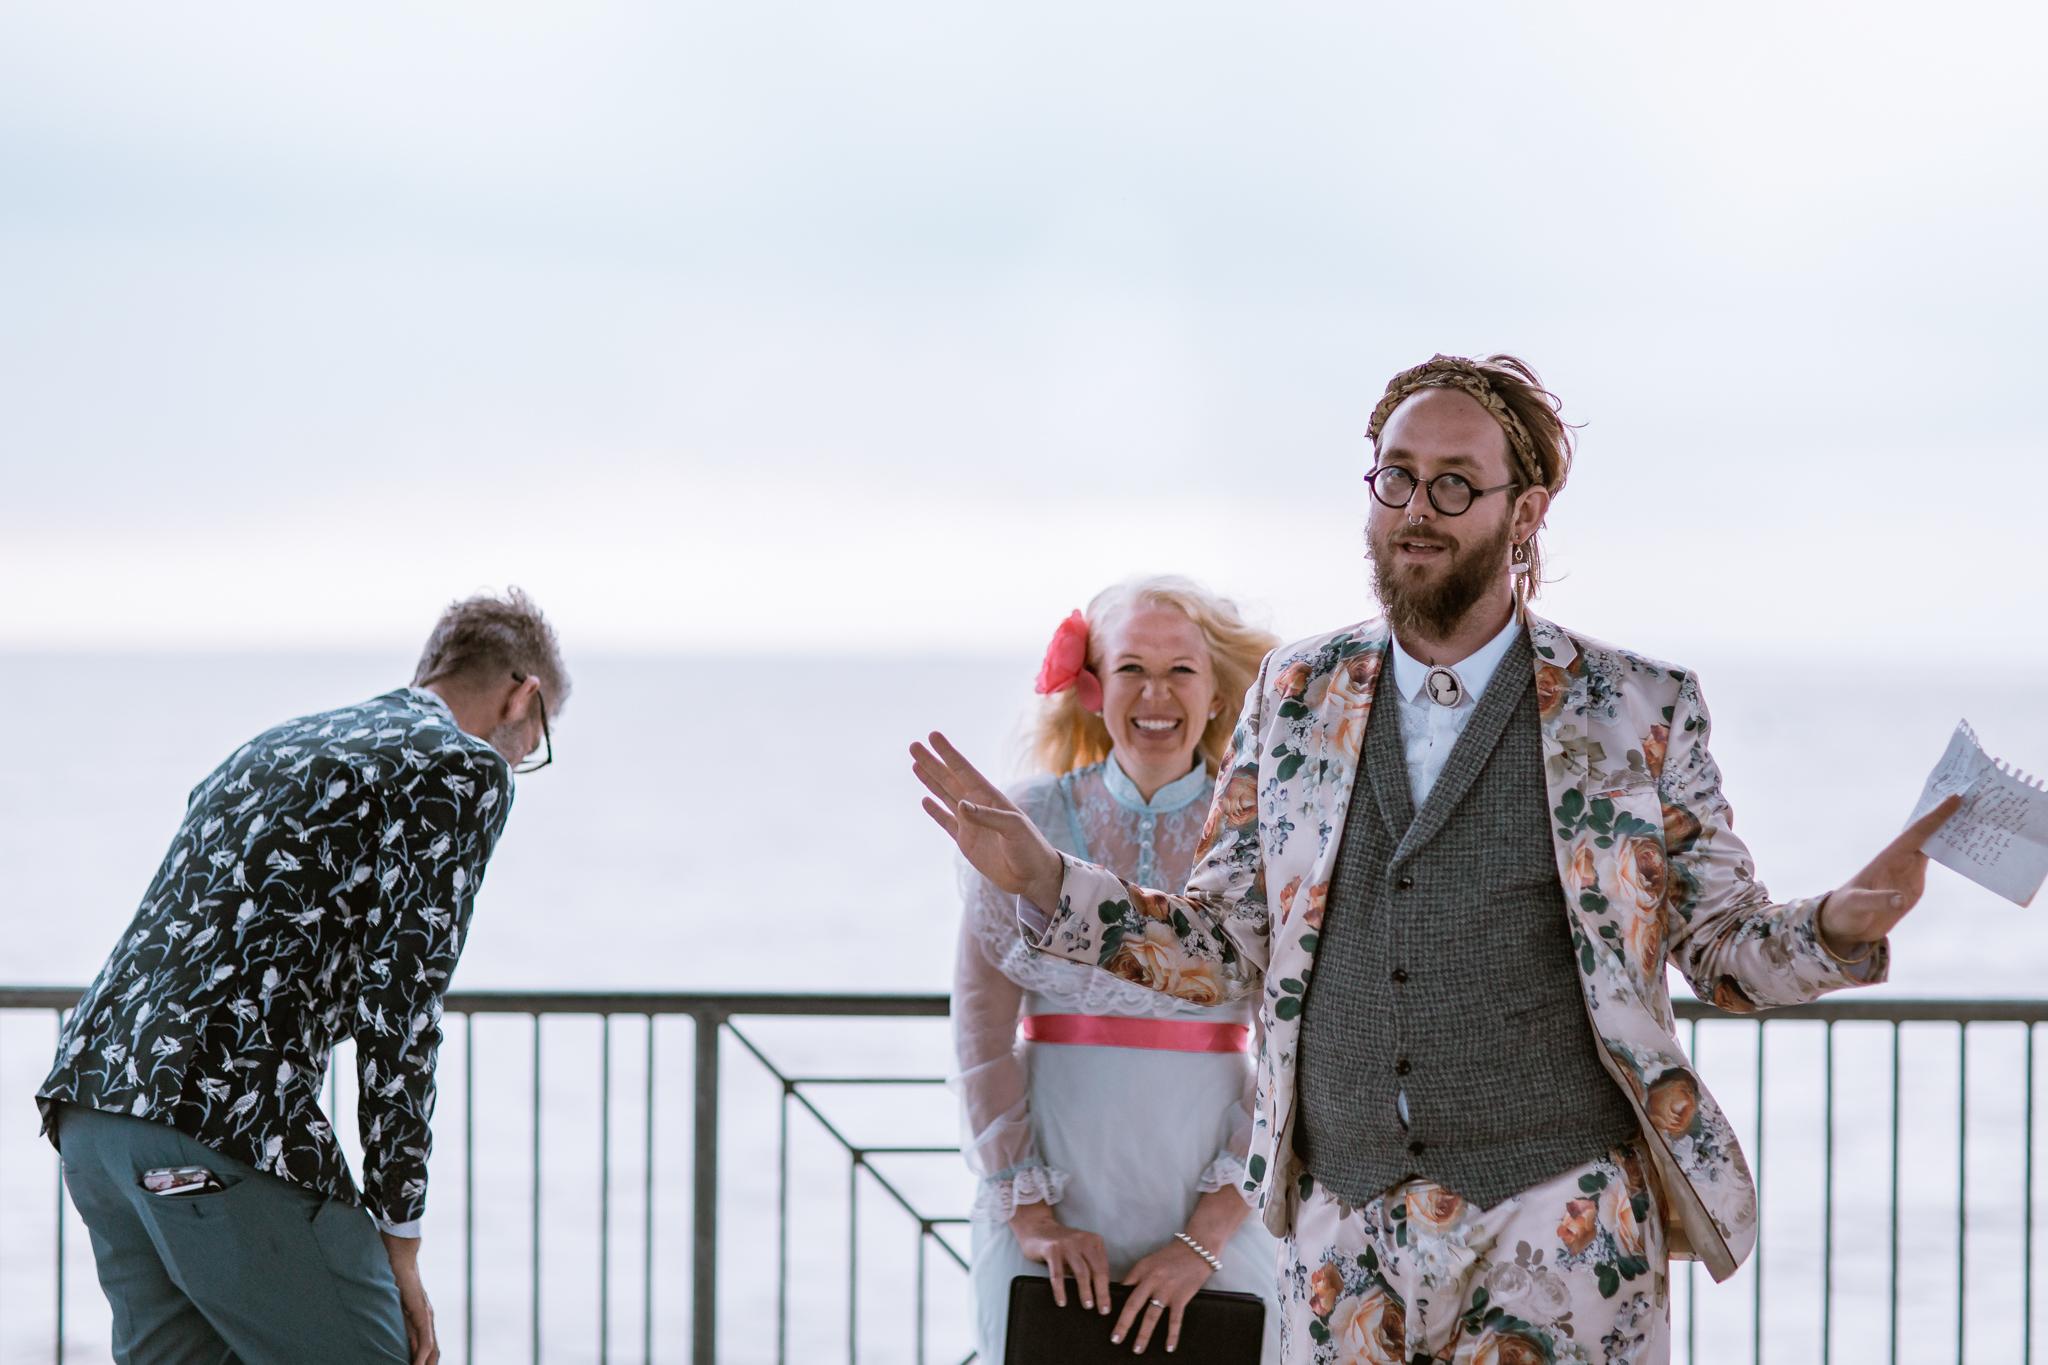 Tim and David - New orleans Wedding - Kallistia Photography-13.jpg